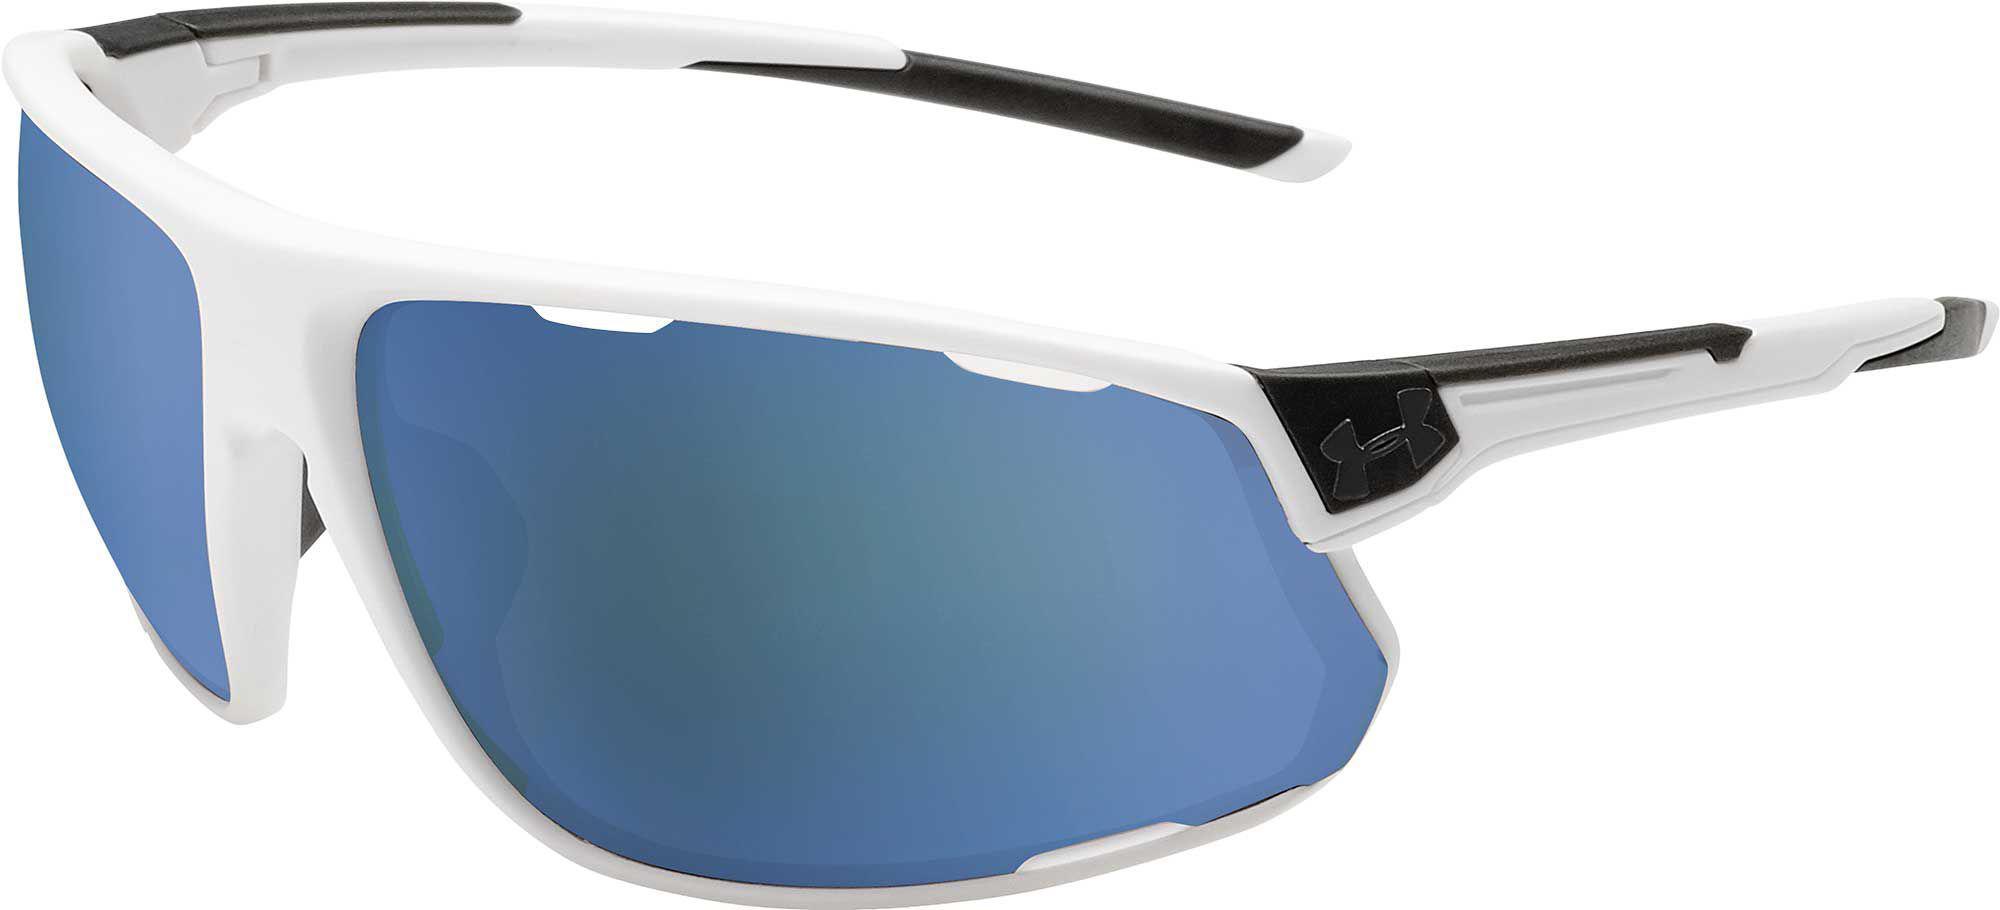 5931ed19e22 Lyst - Under Armour Strive Tuned Baseball Sunglasses in Blue for Men